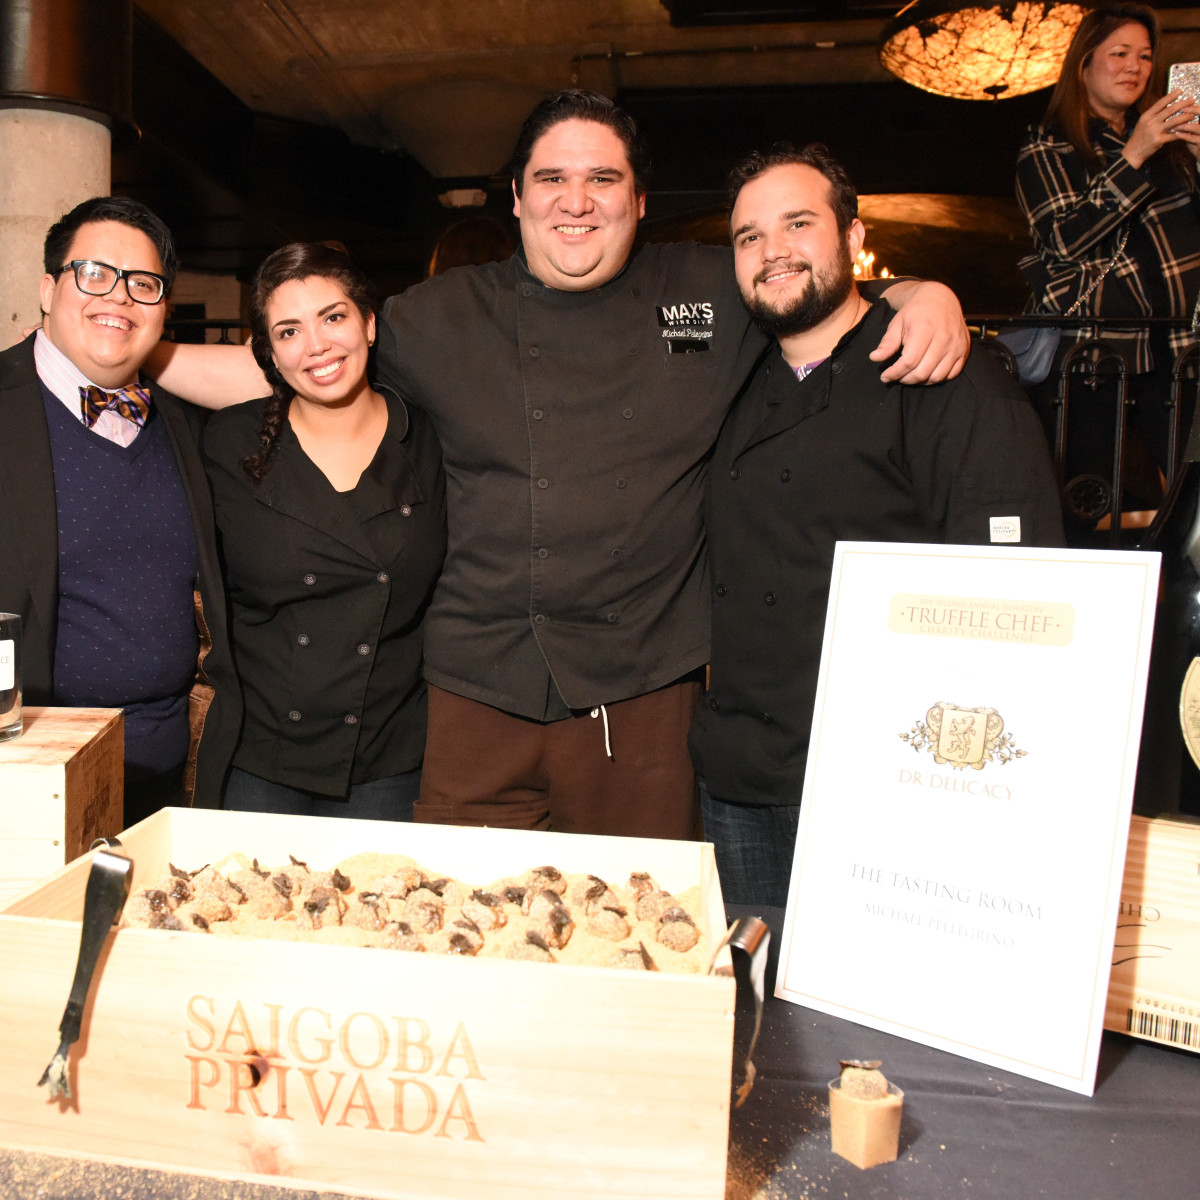 Houston, Truffle Chef Charity Challenge, January 2016, Tasting Room_Chef Michael Pellegrino, Nikki Farias, Cesar Hinojosa, Alejandro Betancourt